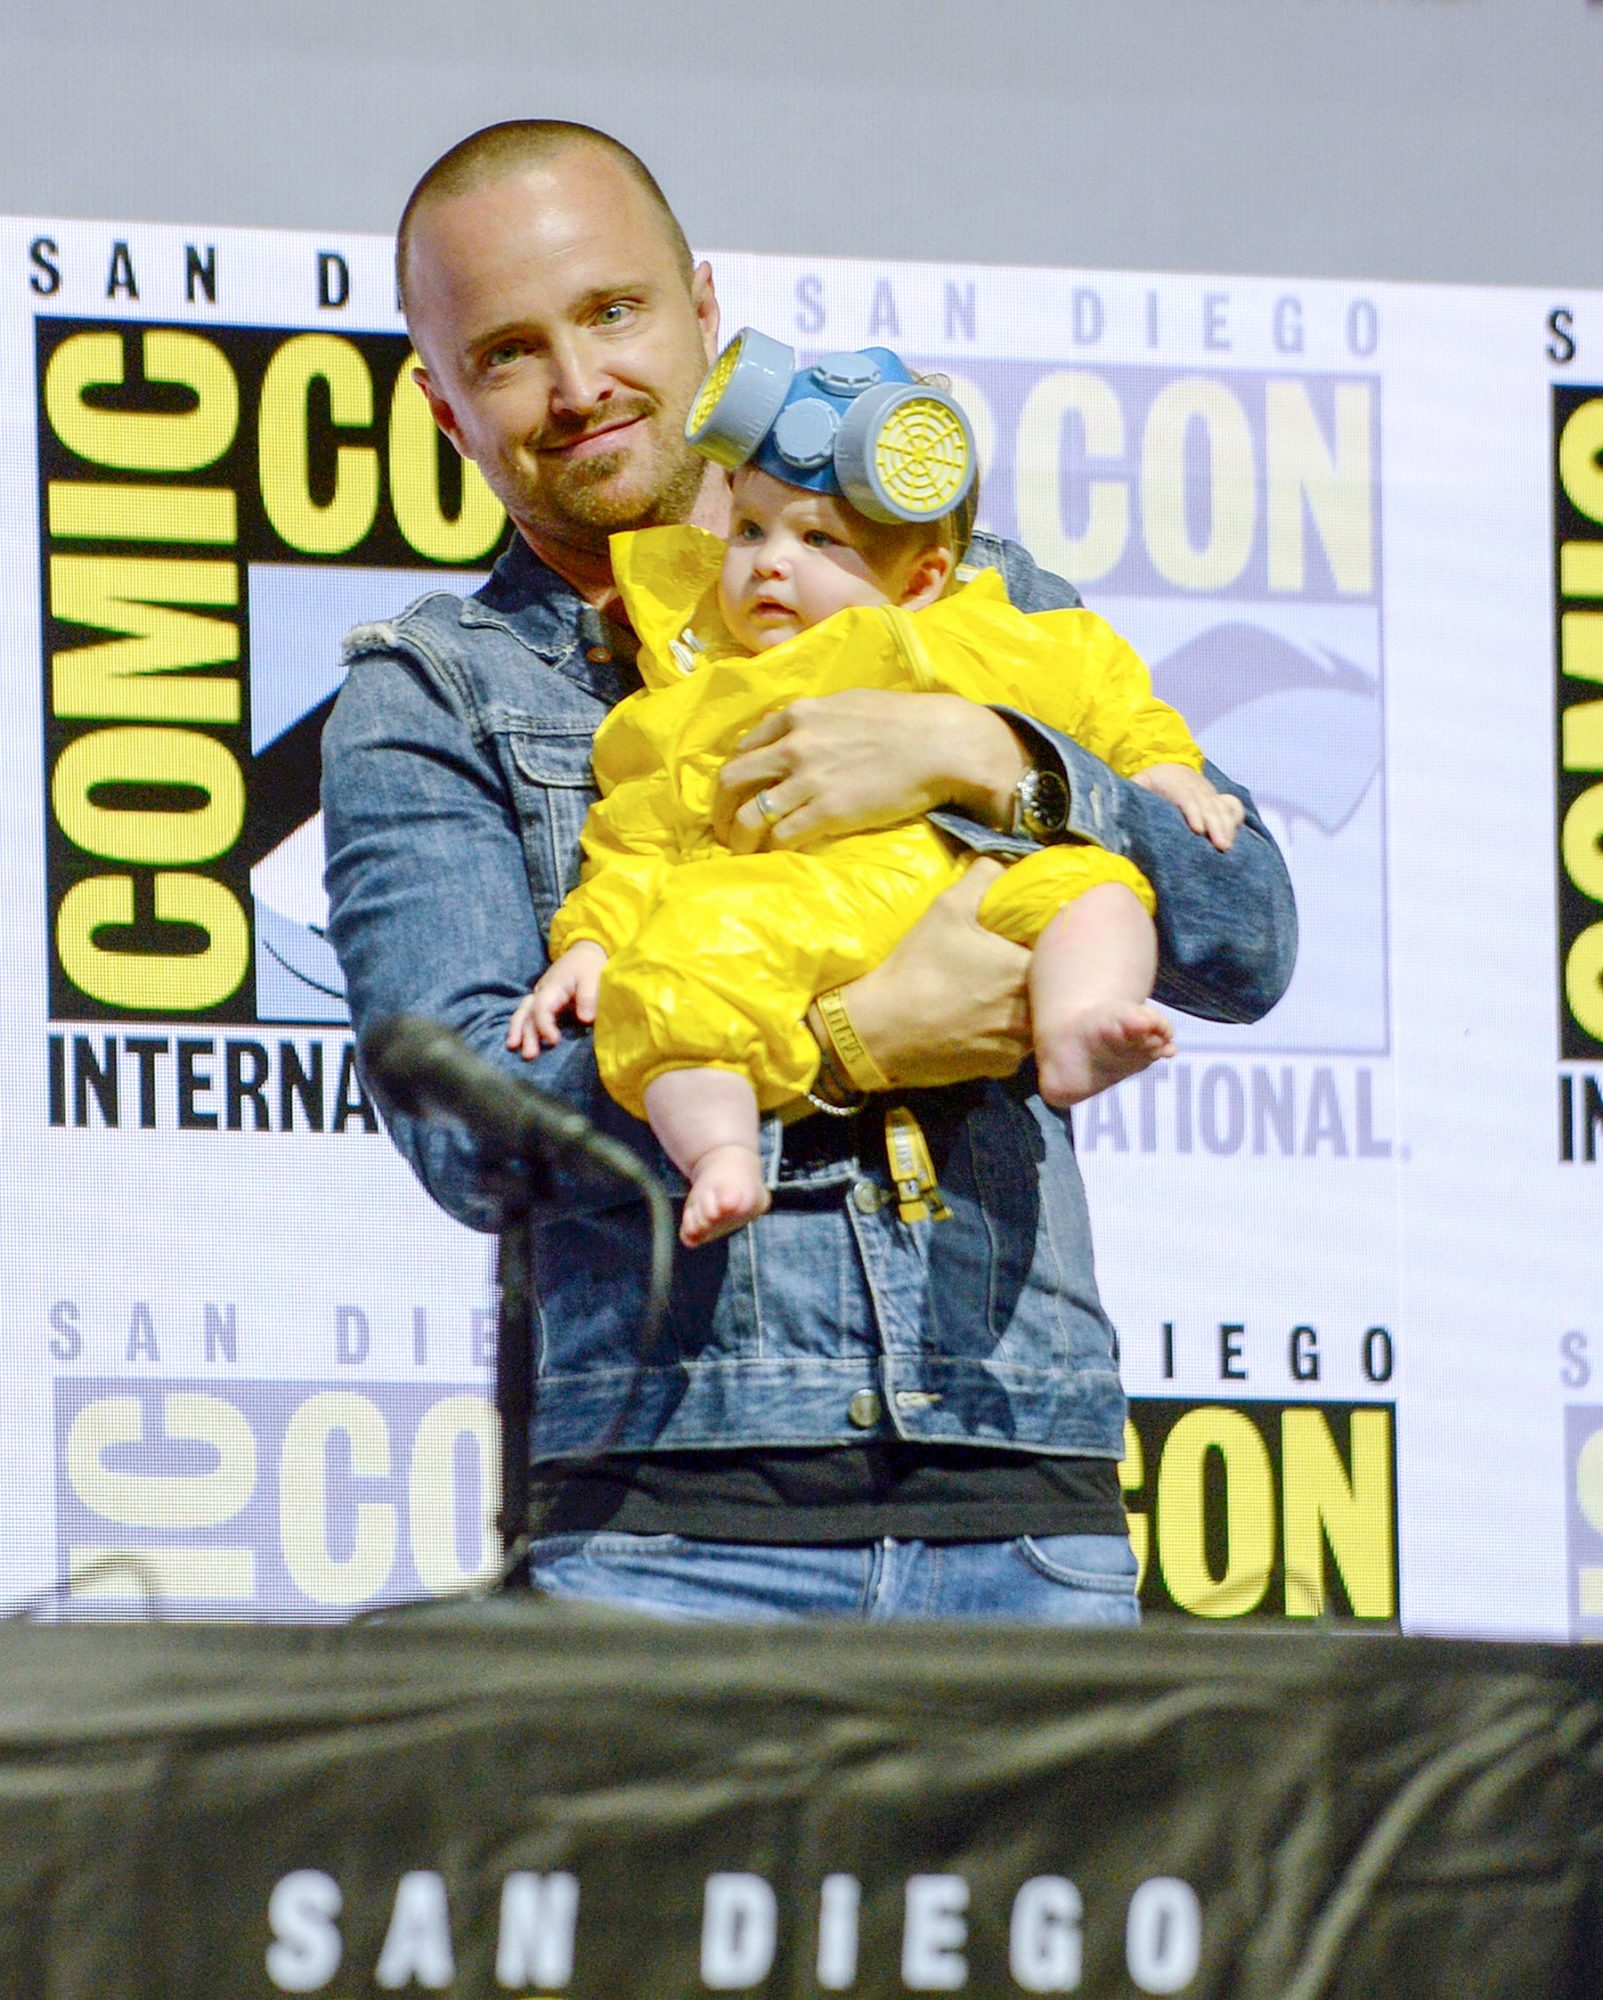 'Breaking Bad' TV show panel, Comic-Con International, San Diego, USA - 19 Jul 2018